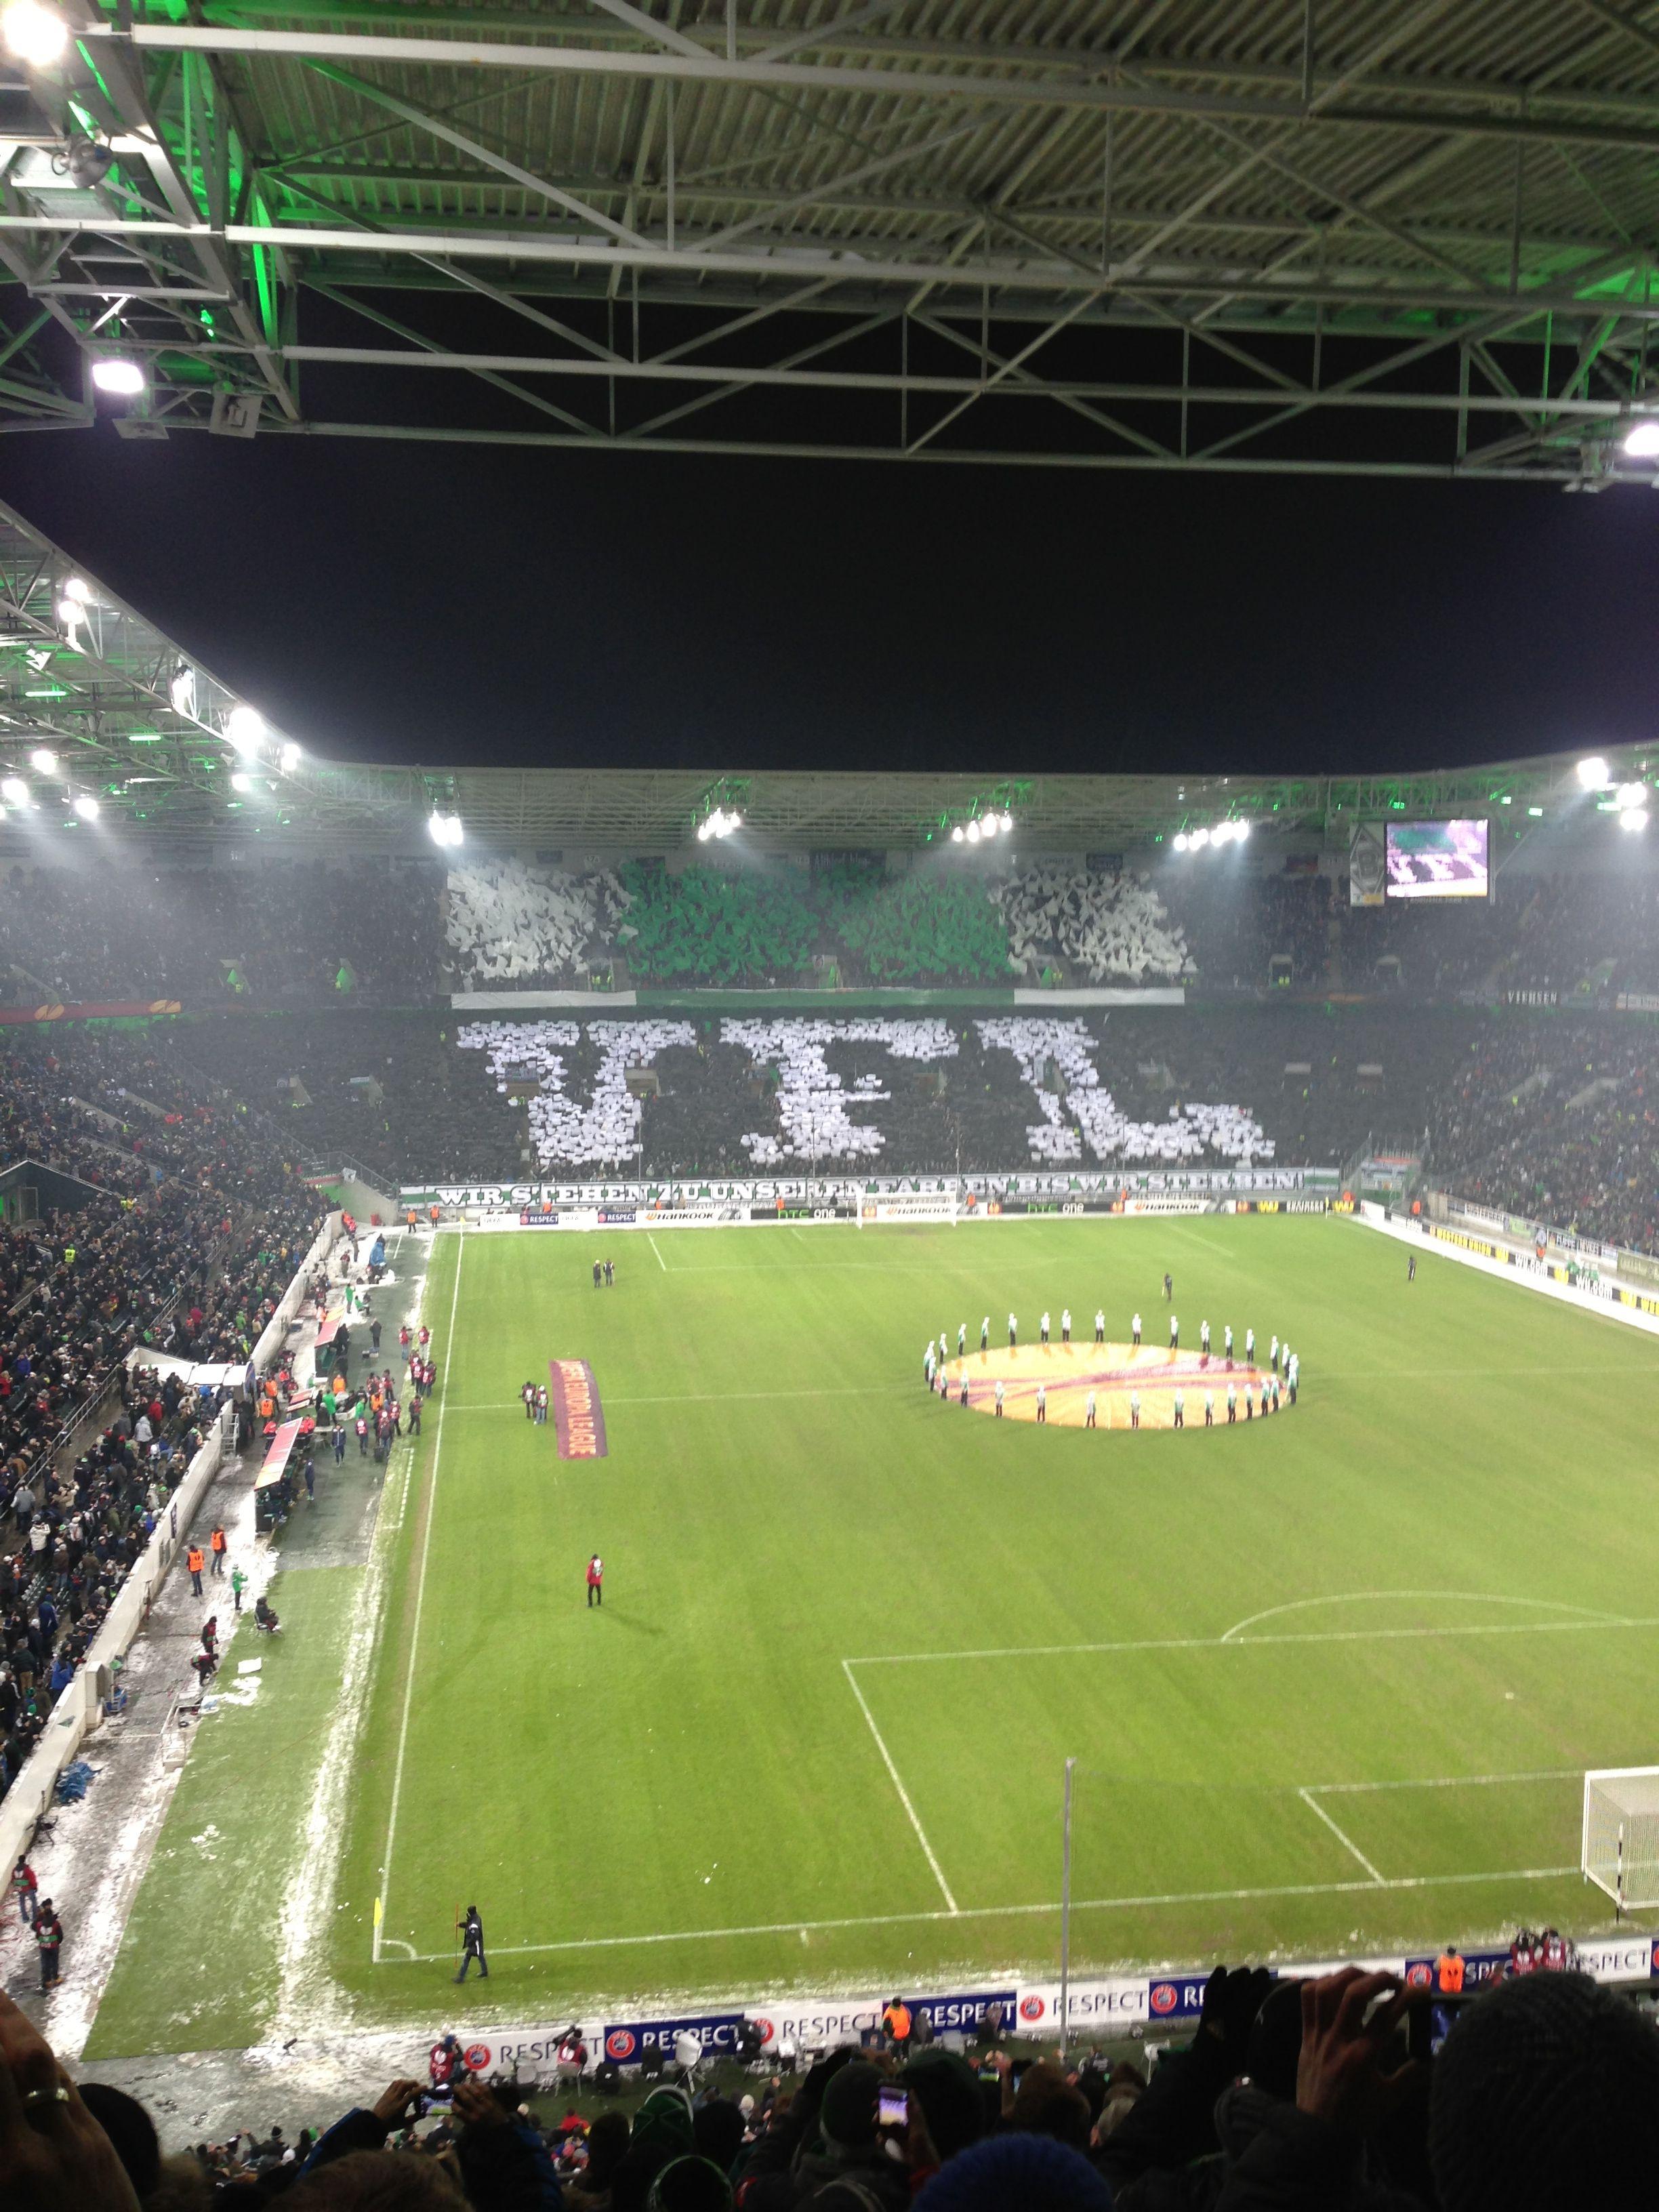 Vfl Borussia Monchengladbach Vfl Borussia Monchengladbach Borussia Monchengladbach Vfl Borussia